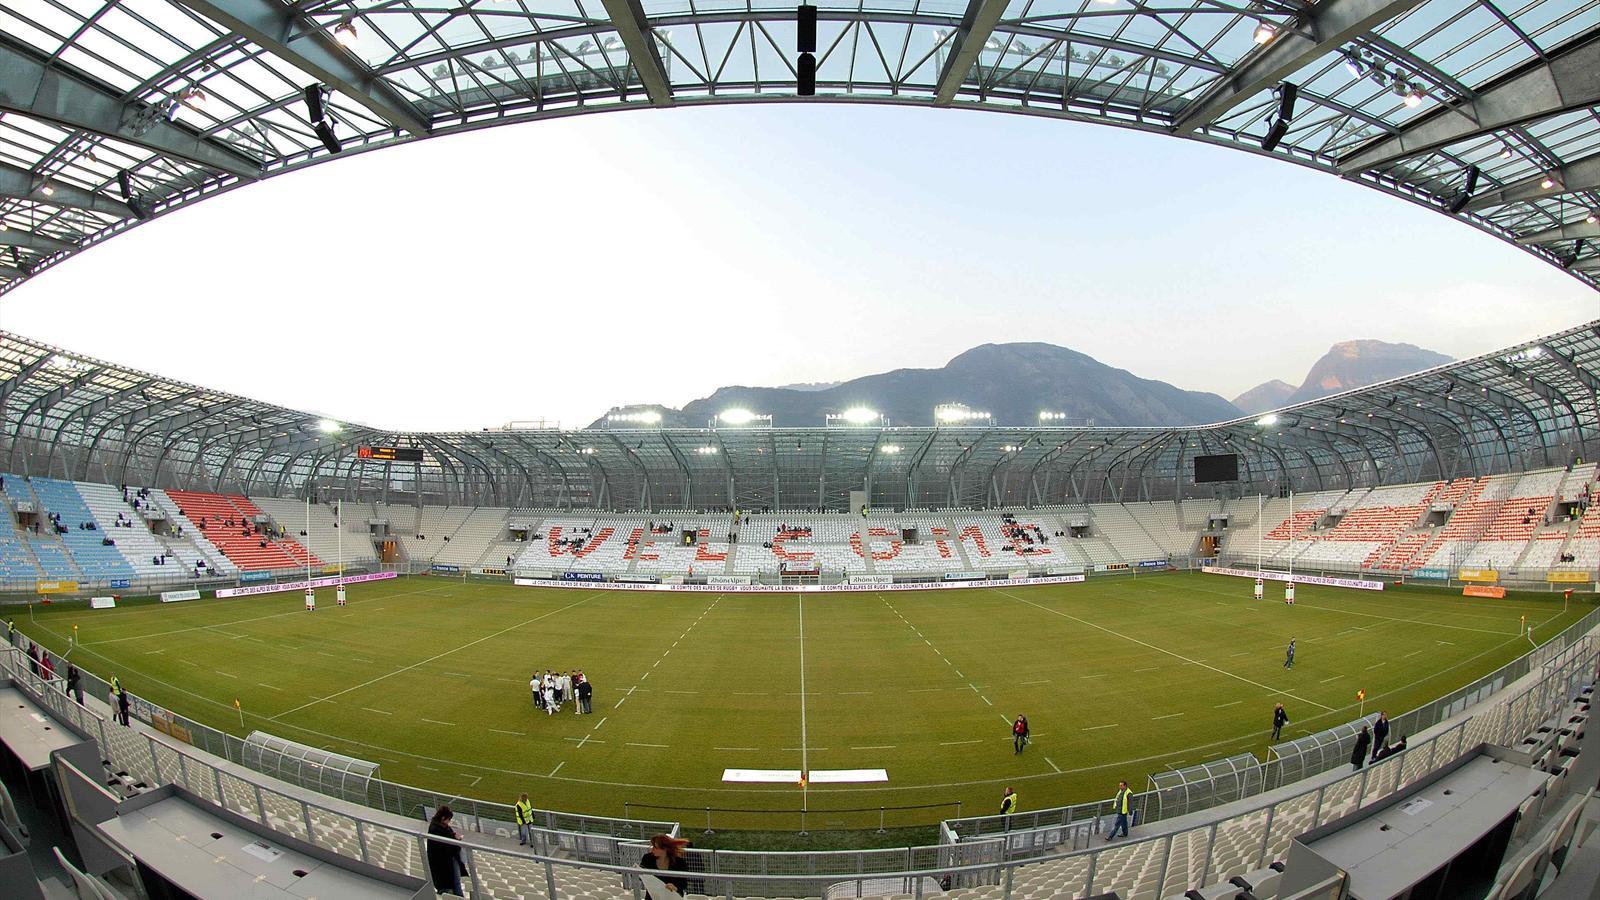 En direct live grenoble fr jus coupe de france football 7 grenoble - Coupe a 10 euros grenoble ...